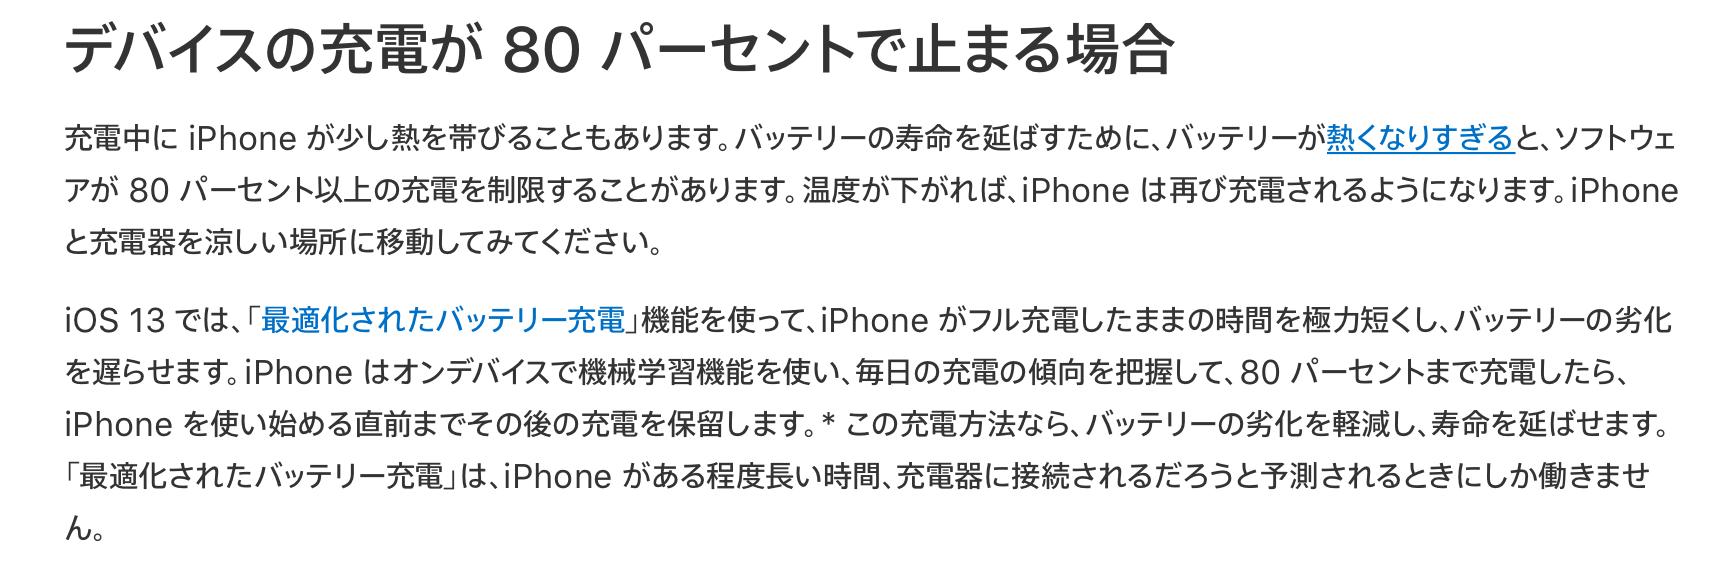 Appleのアナウンス